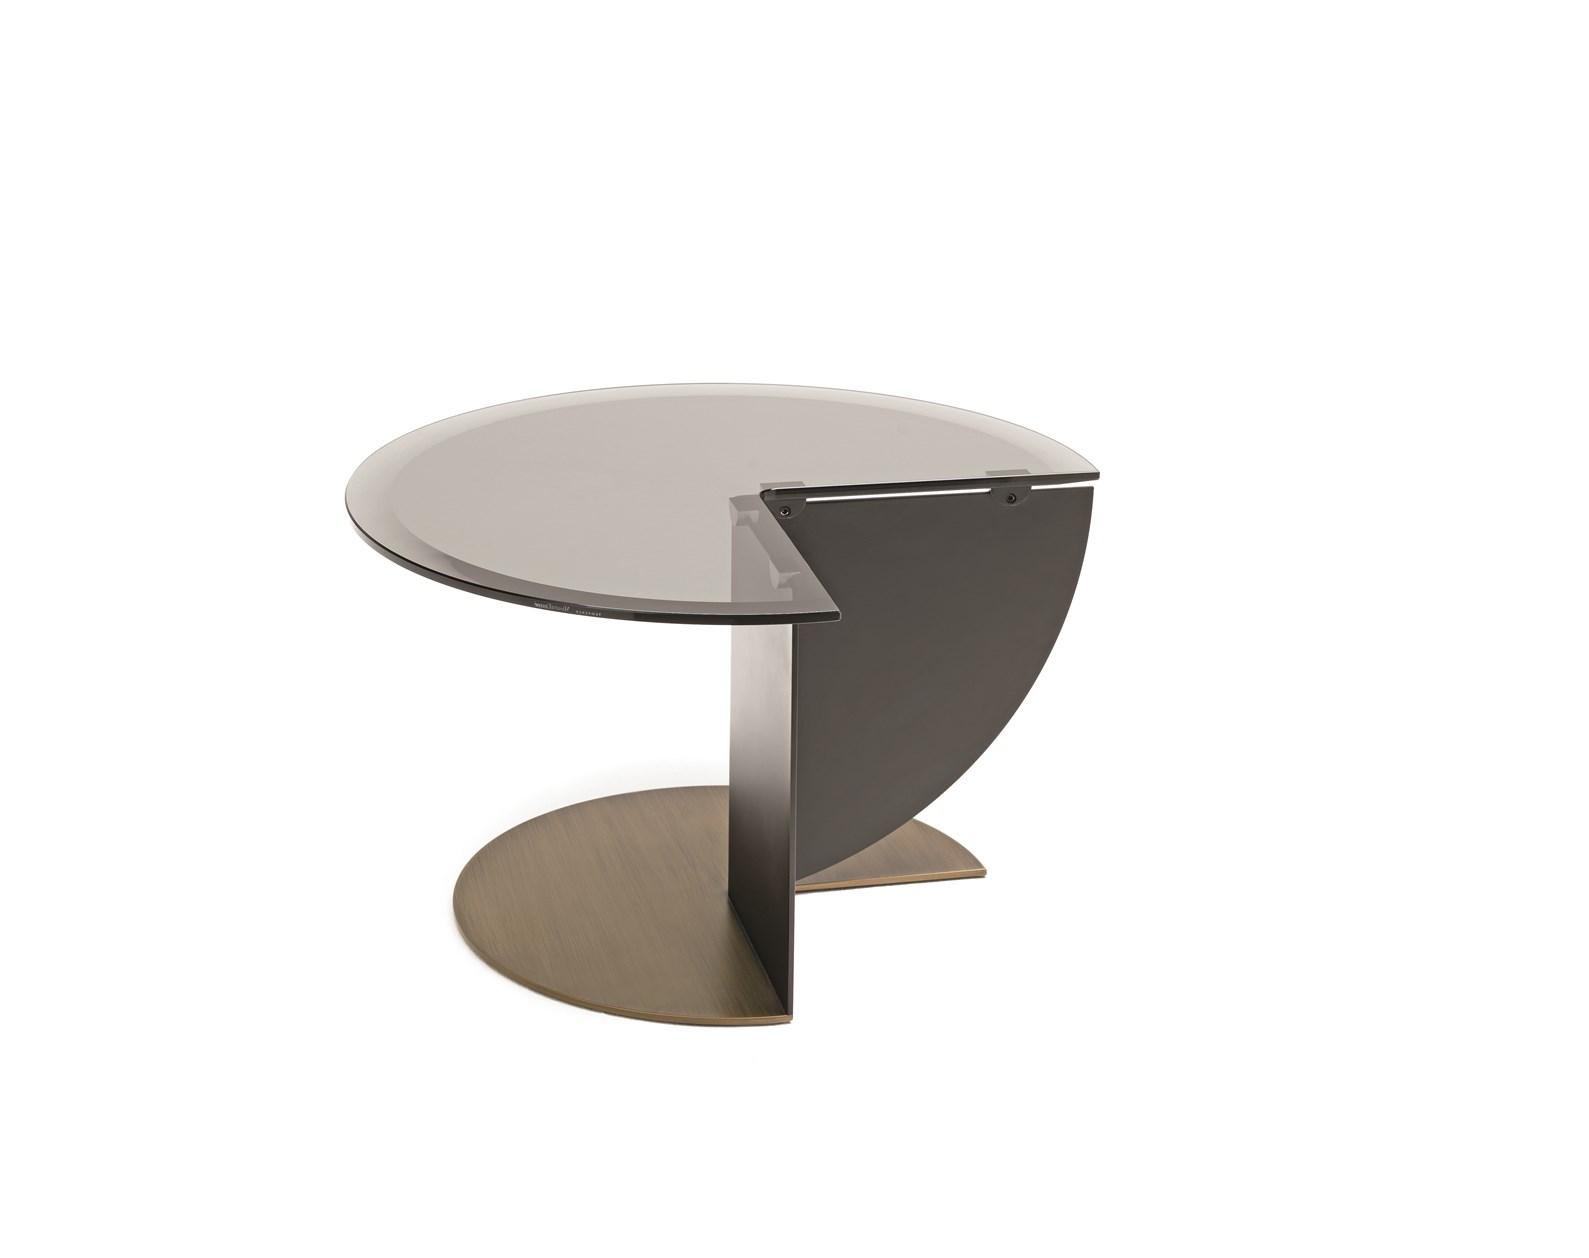 Rialto Side Table by MisuraEmme